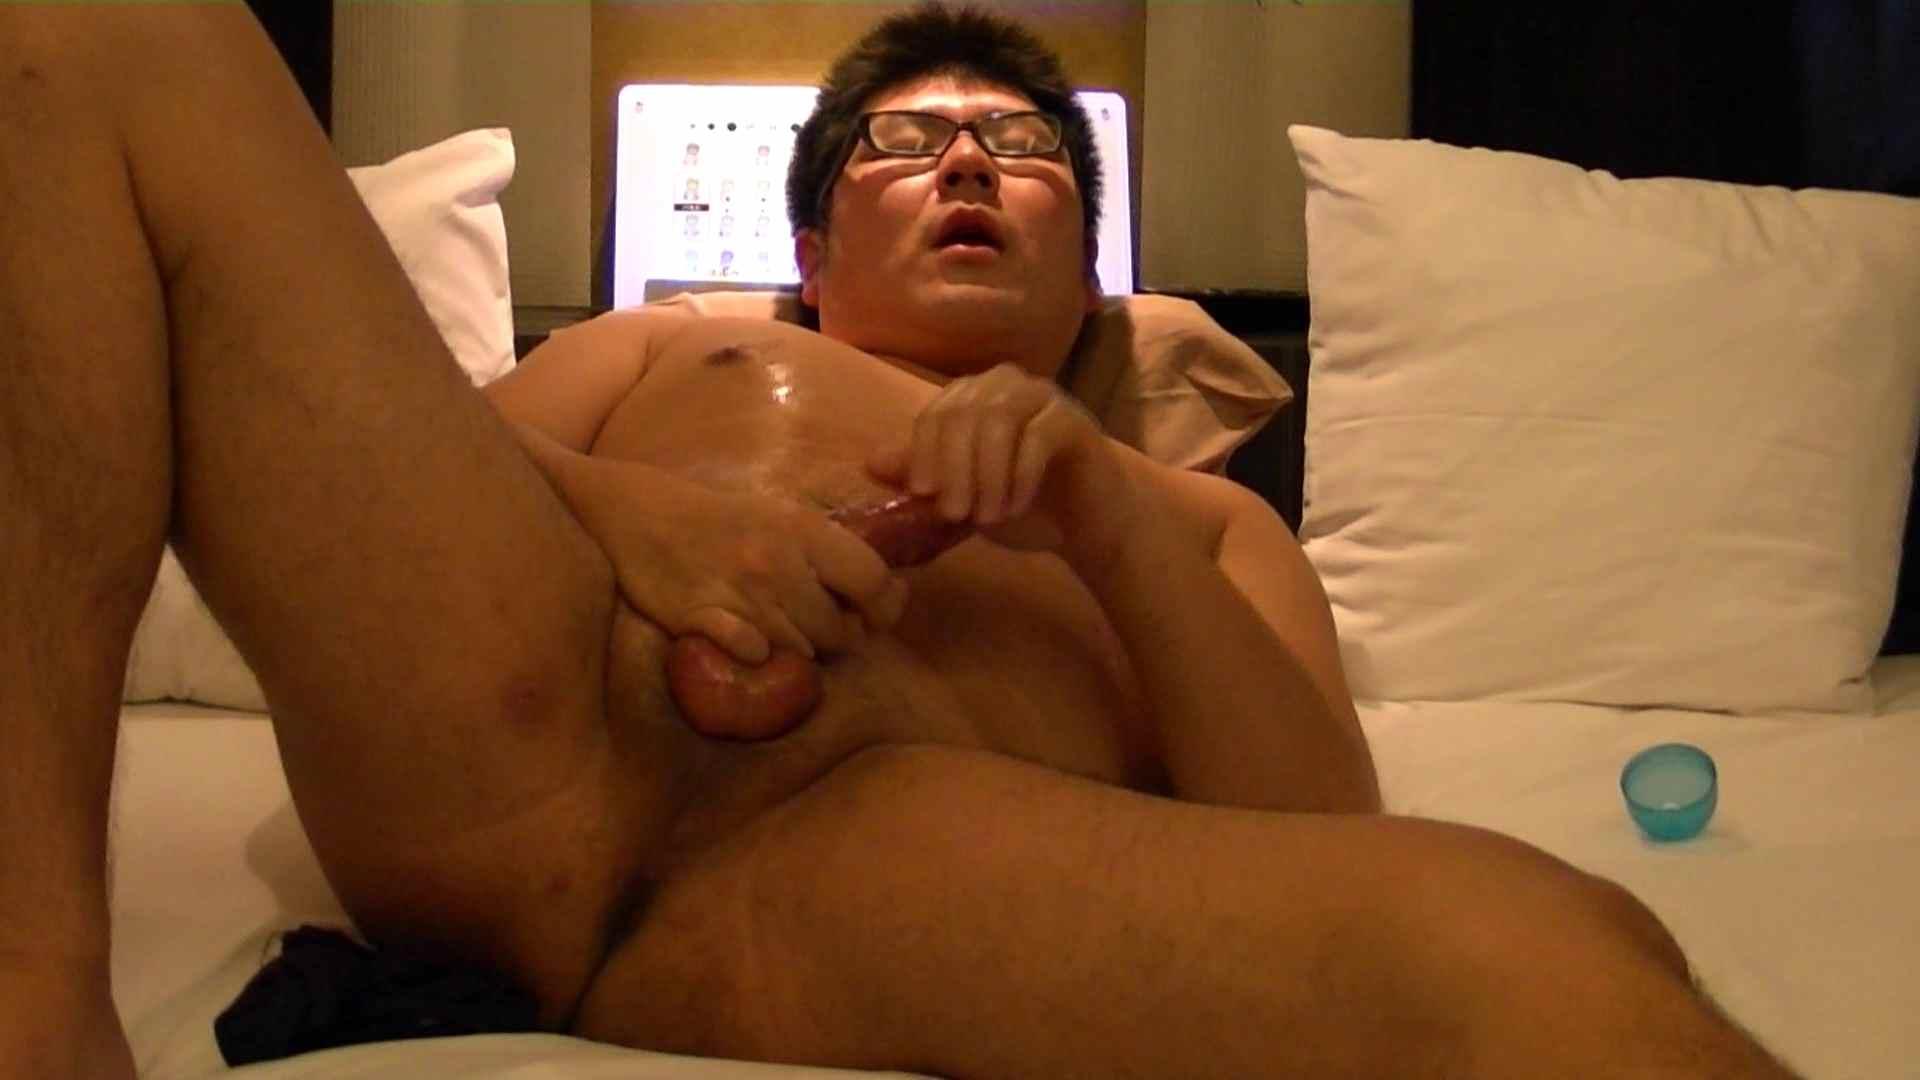 Mr.オナックスさん投稿!HD 貴方のオナニー三万円で撮影させてください。VOL.03 後編 完全無修正版  106枚 72